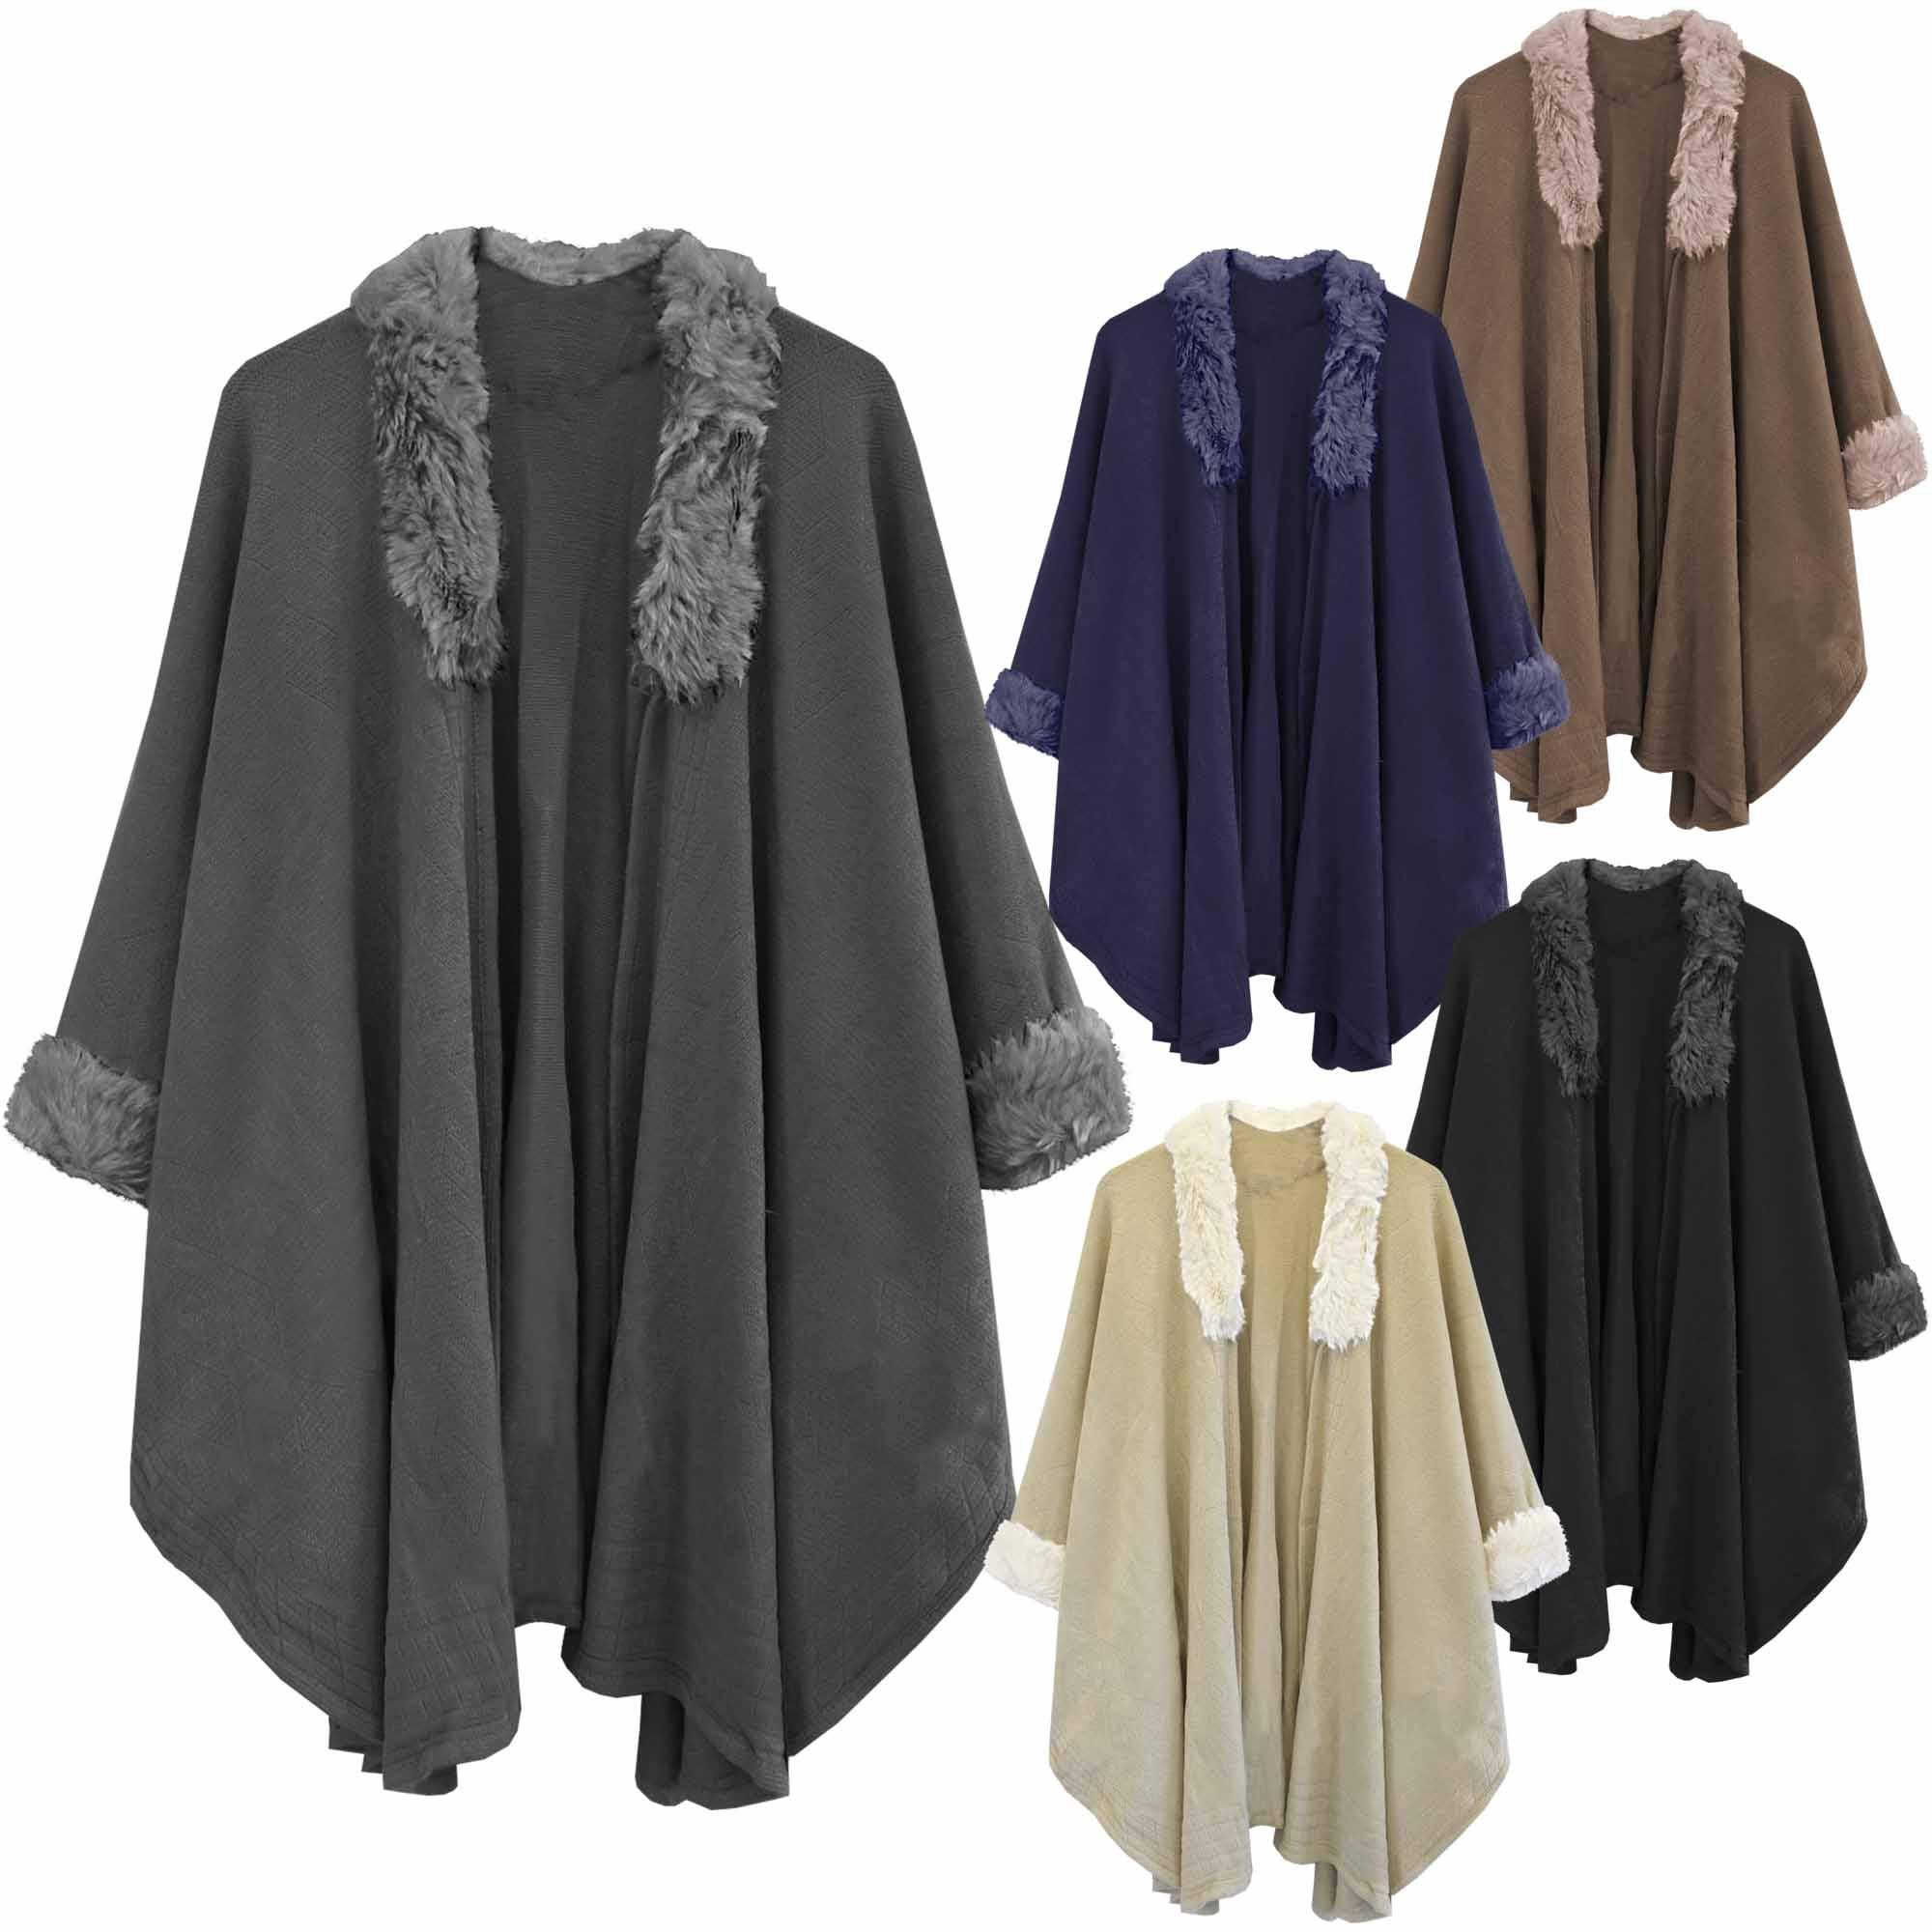 WOMEN LADIES BLACK CAPE WOOL FUR COLLAR BLANKET COAT WINTER JACKET ...